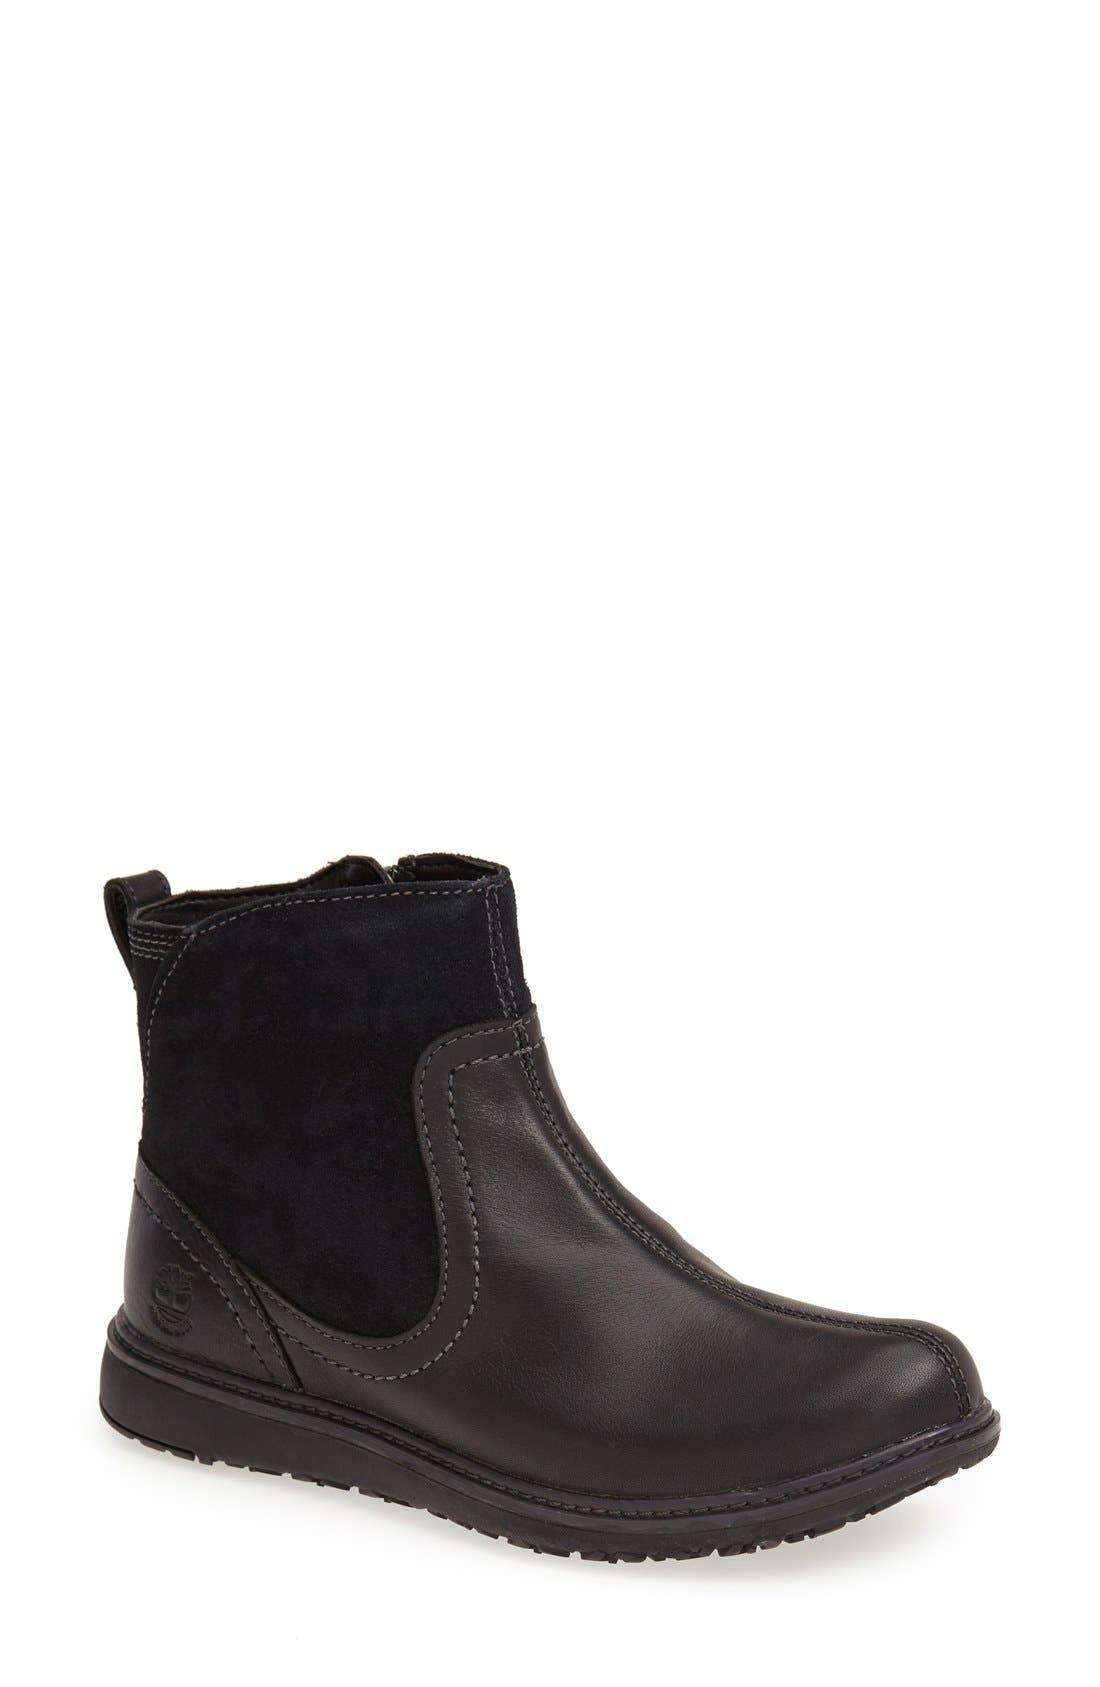 Alternate Image 1 Selected - Timberland Earthkeepers® 'Ashdale' Waterproof Ankle Boot (Women)